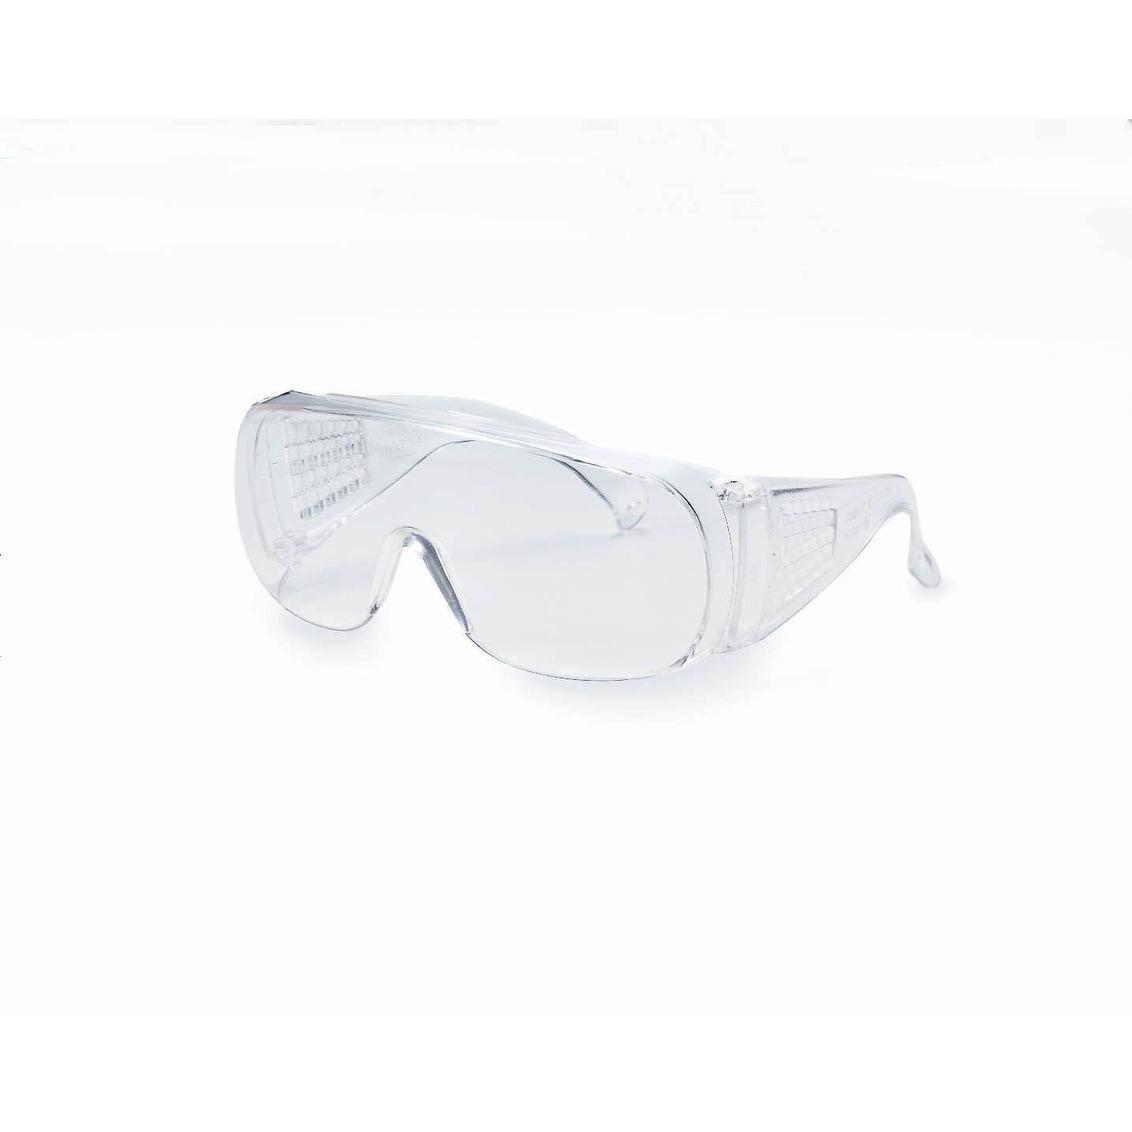 Jackson Safety 3000285 Unispec II Clear Safety Glasses